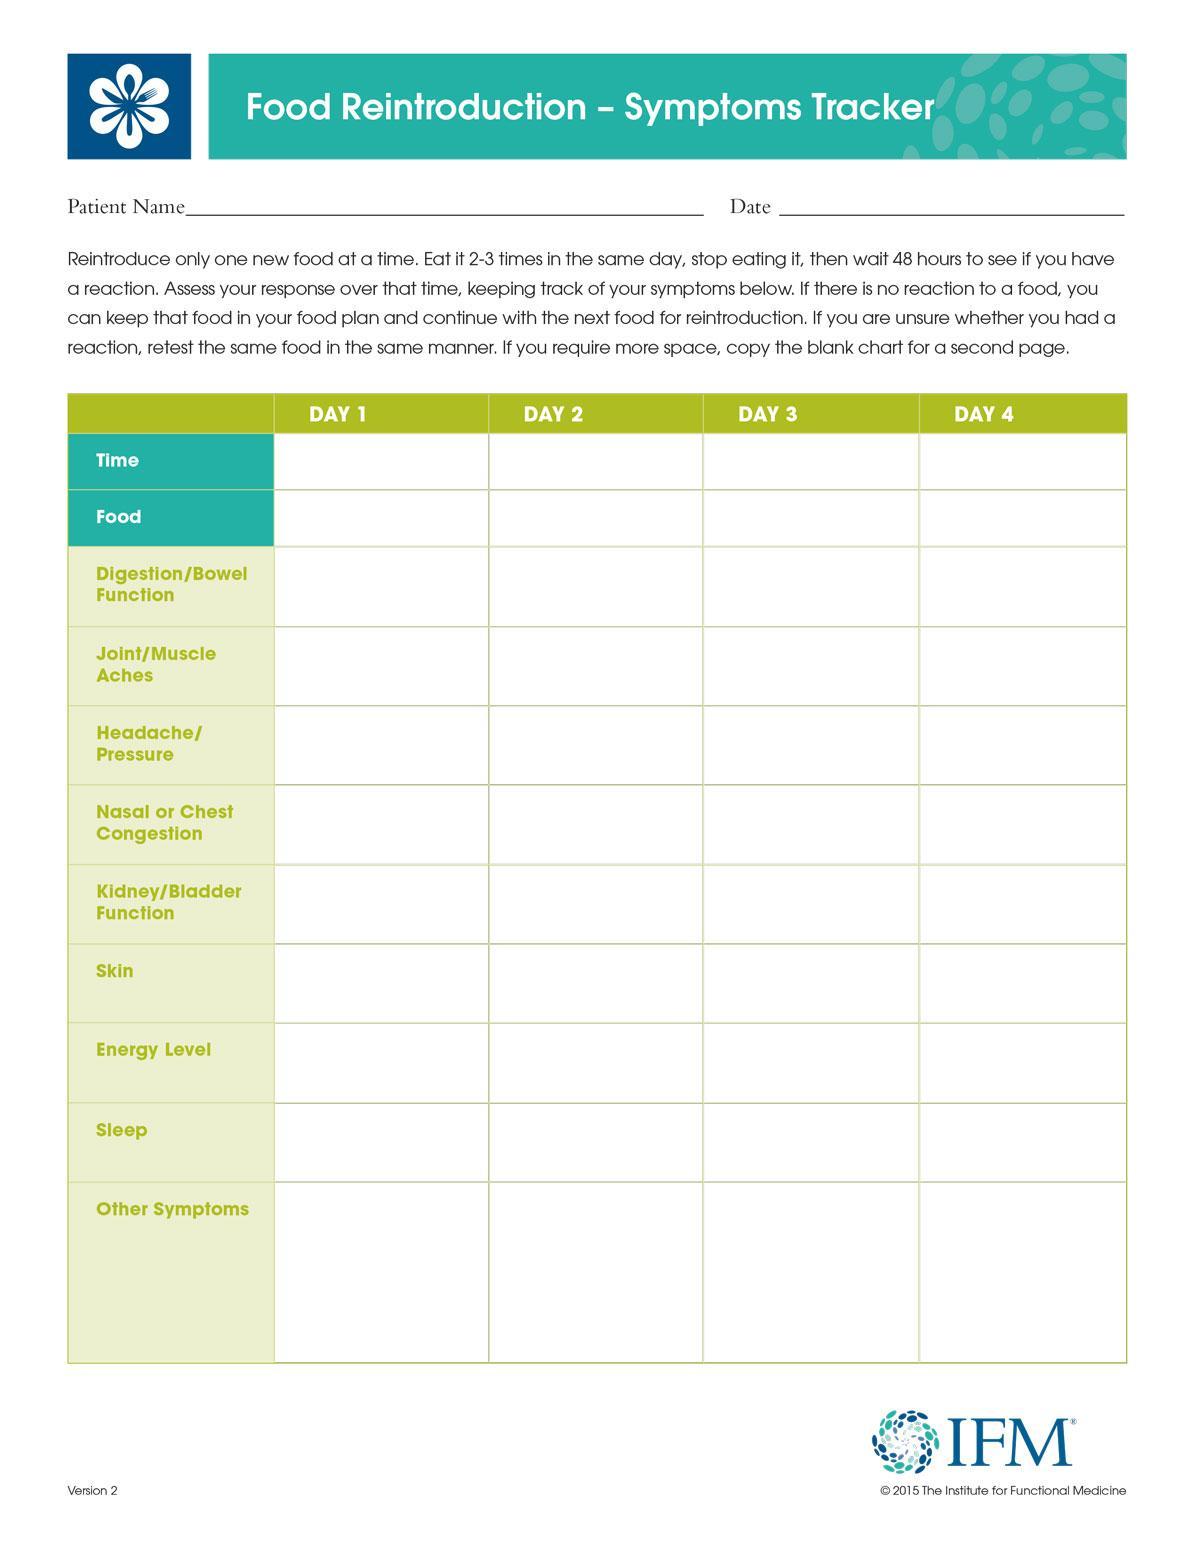 Food Reintroduction Symptoms Tracker